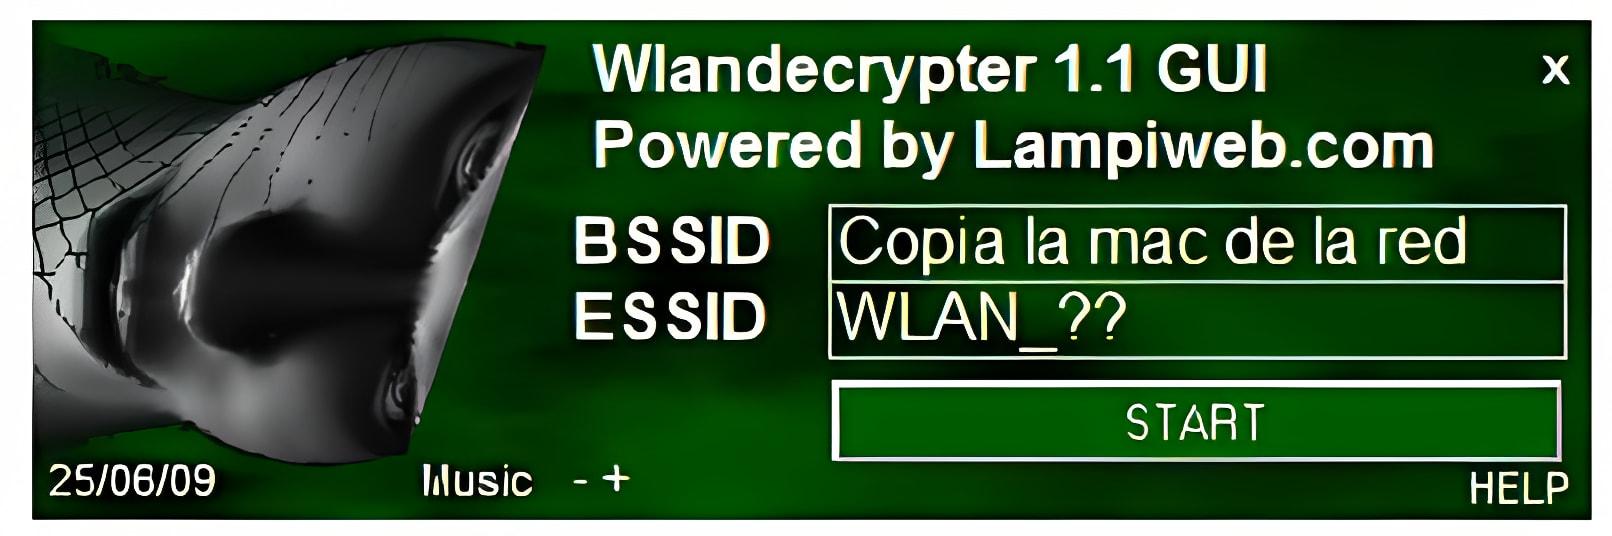 Wlandecrypter